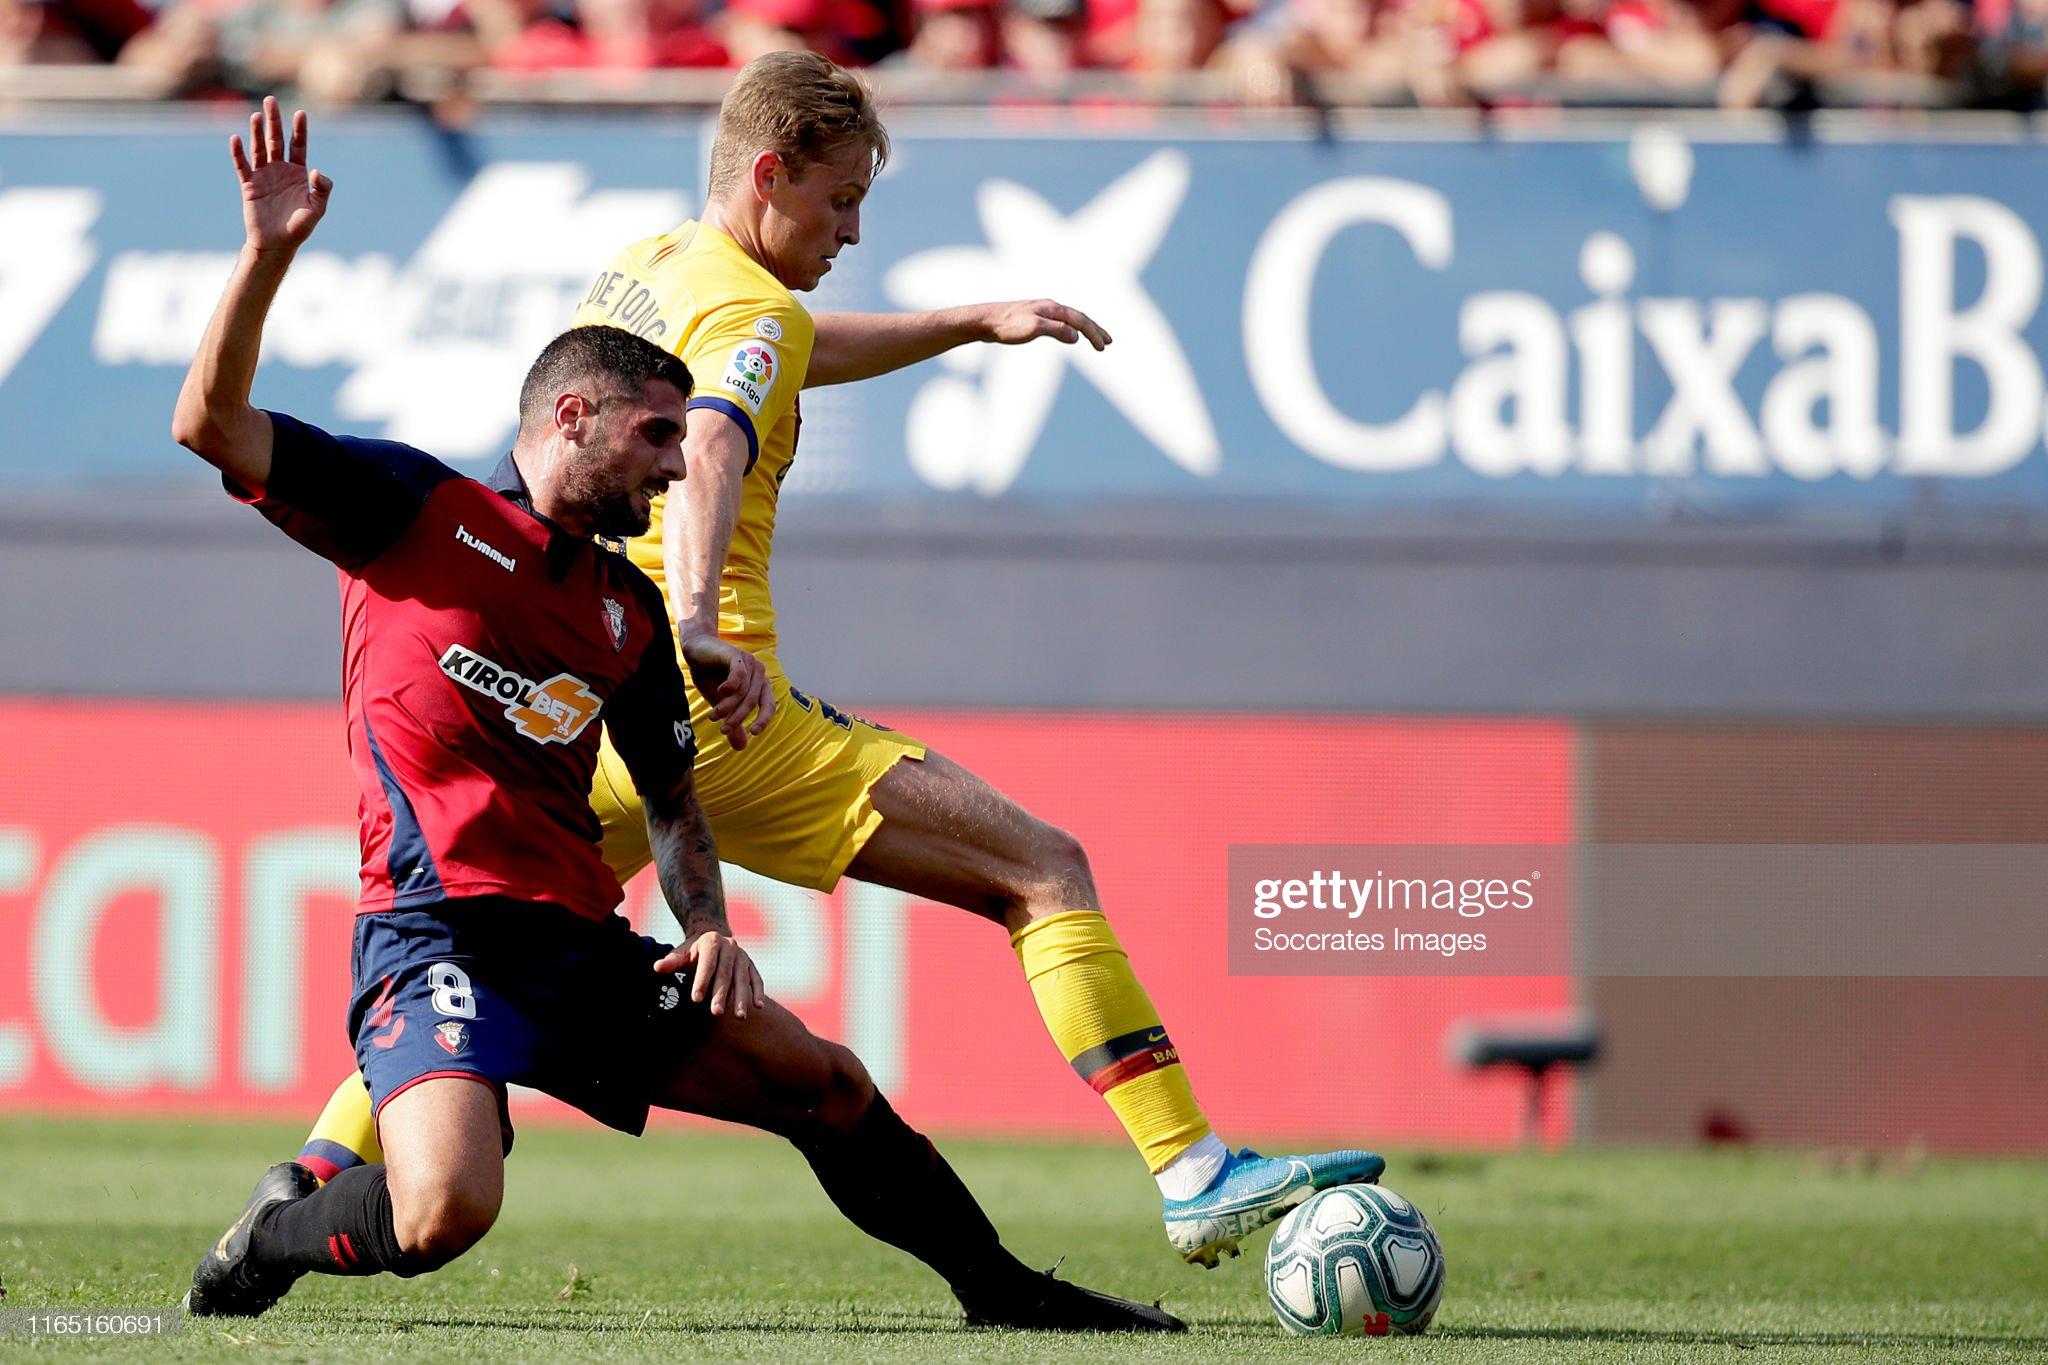 صور مباراة : أوساسونا - برشلونة 2-2 ( 31-08-2019 )  Frenkie-de-jong-of-fc-barcelona-during-the-la-liga-santander-match-picture-id1165160691?s=2048x2048